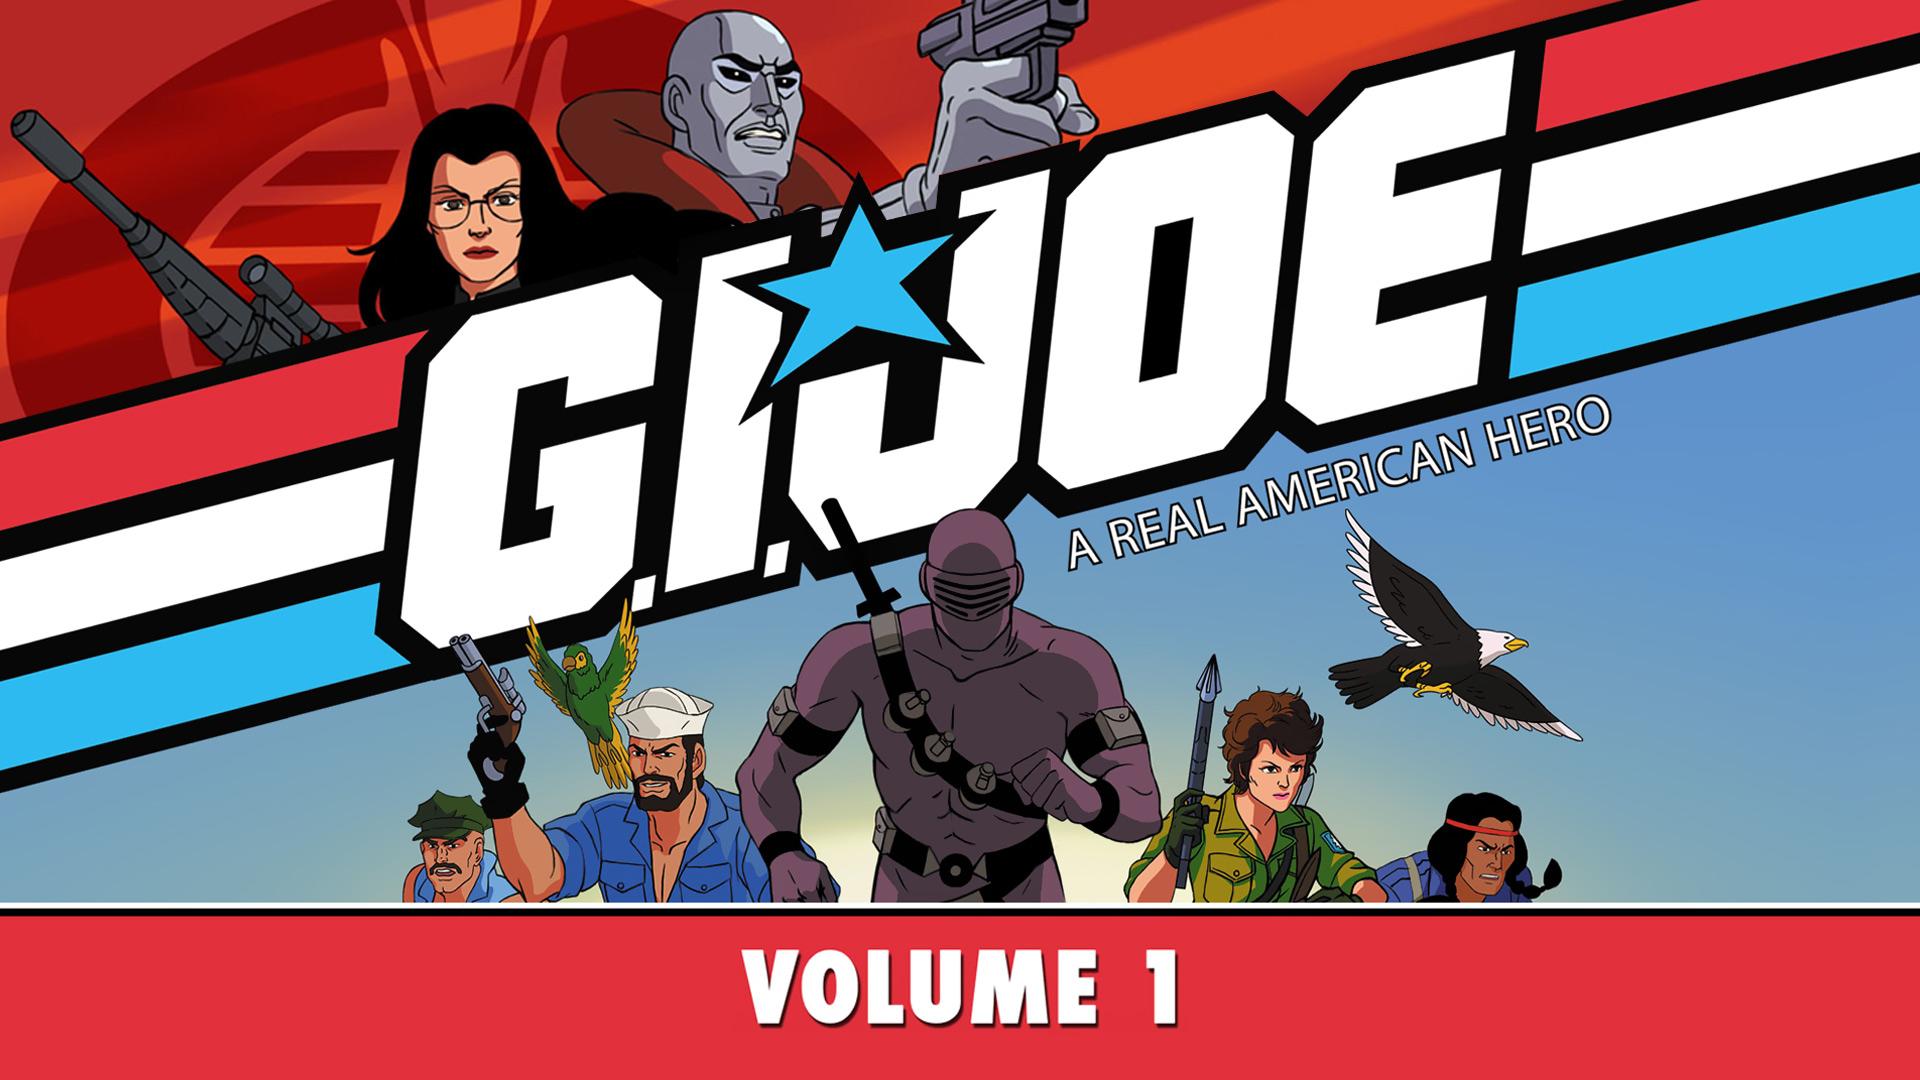 GI Joe: A Real American Hero, Volume 1